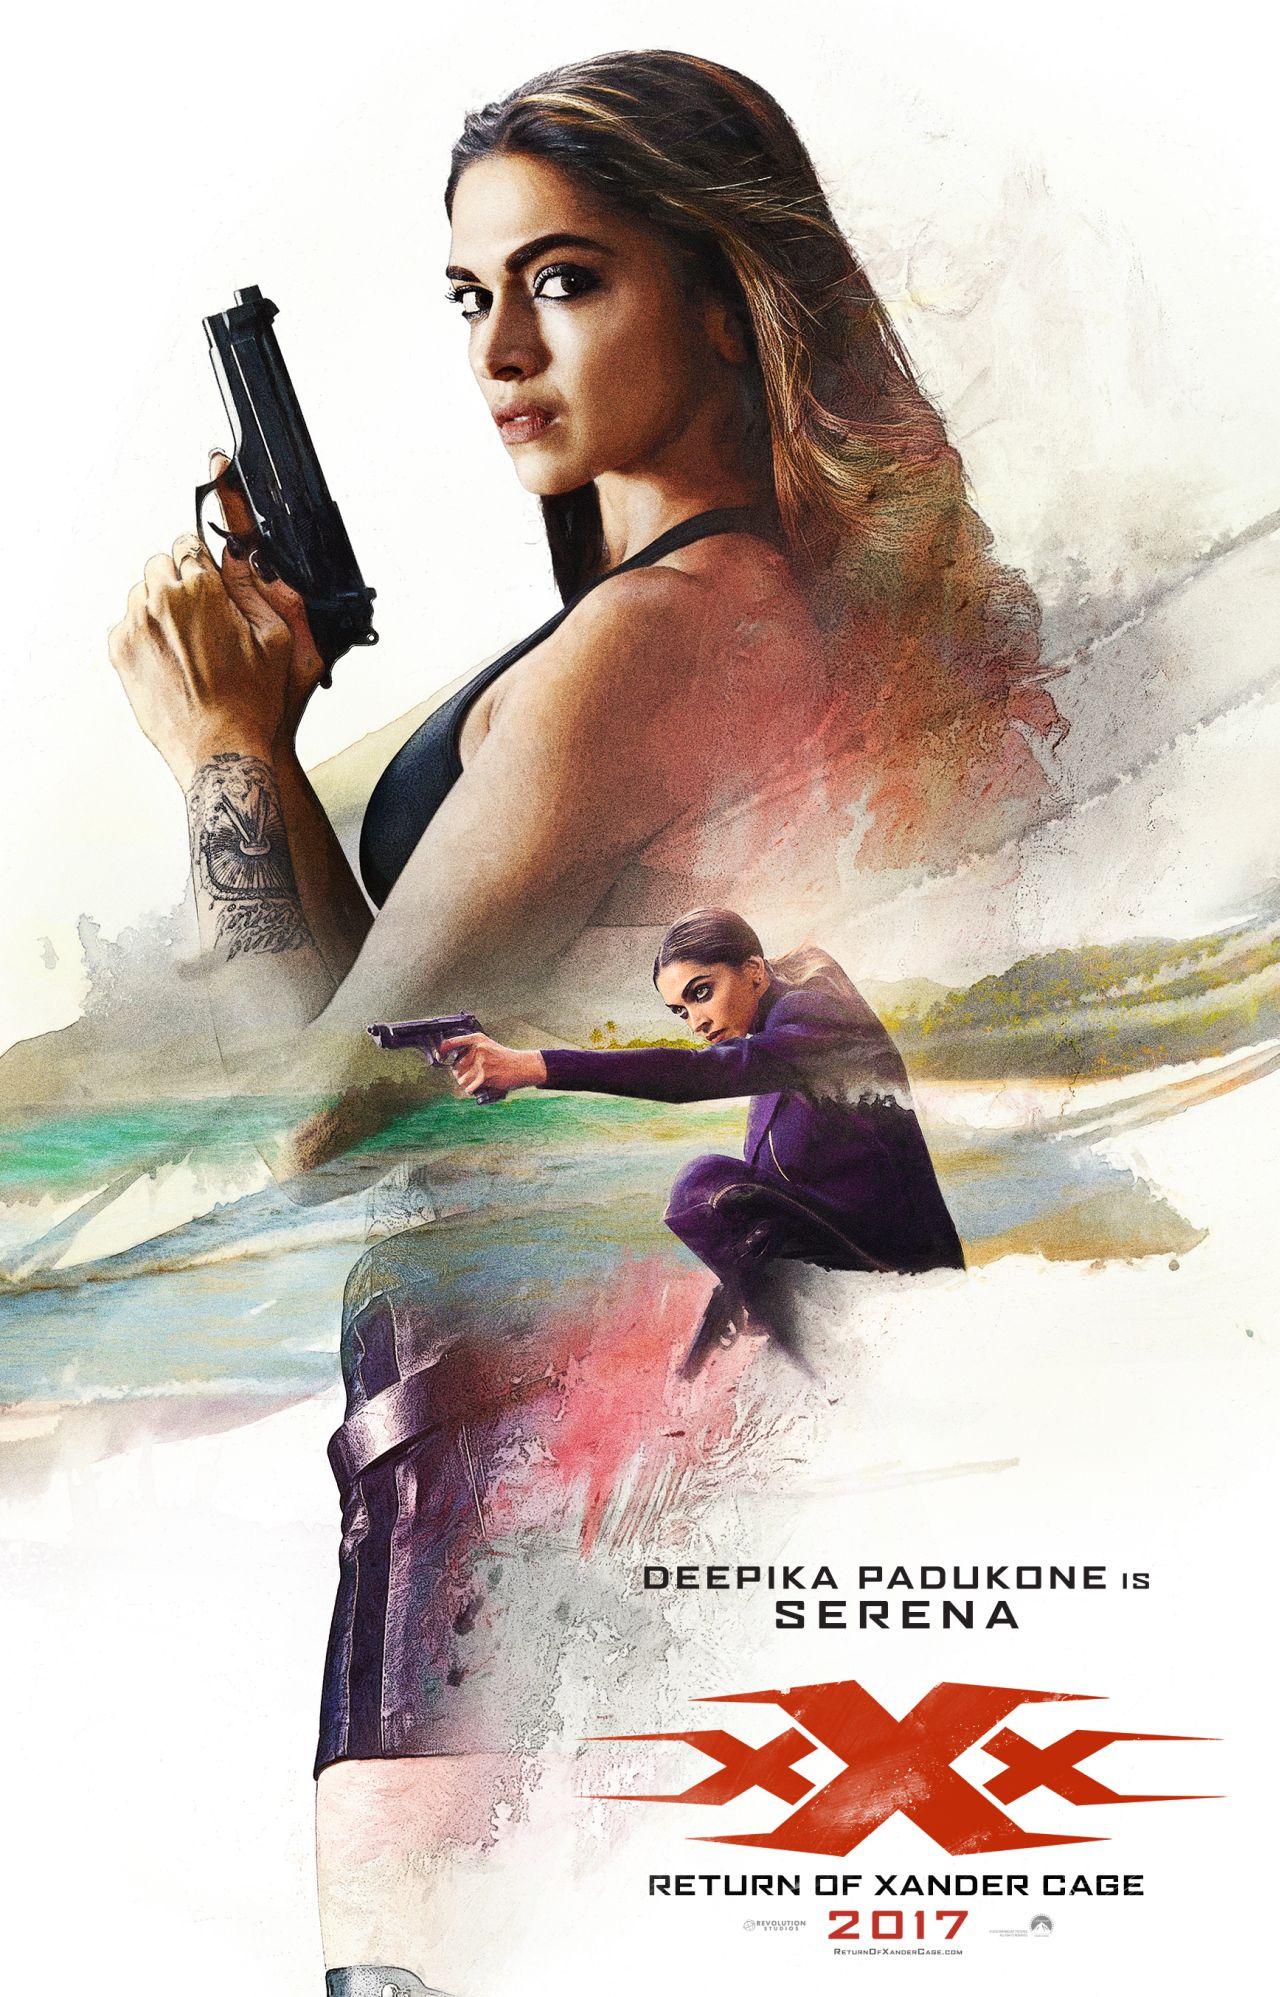 xXx: Return of Xander Cage - Il character poster di Deepika Padukone